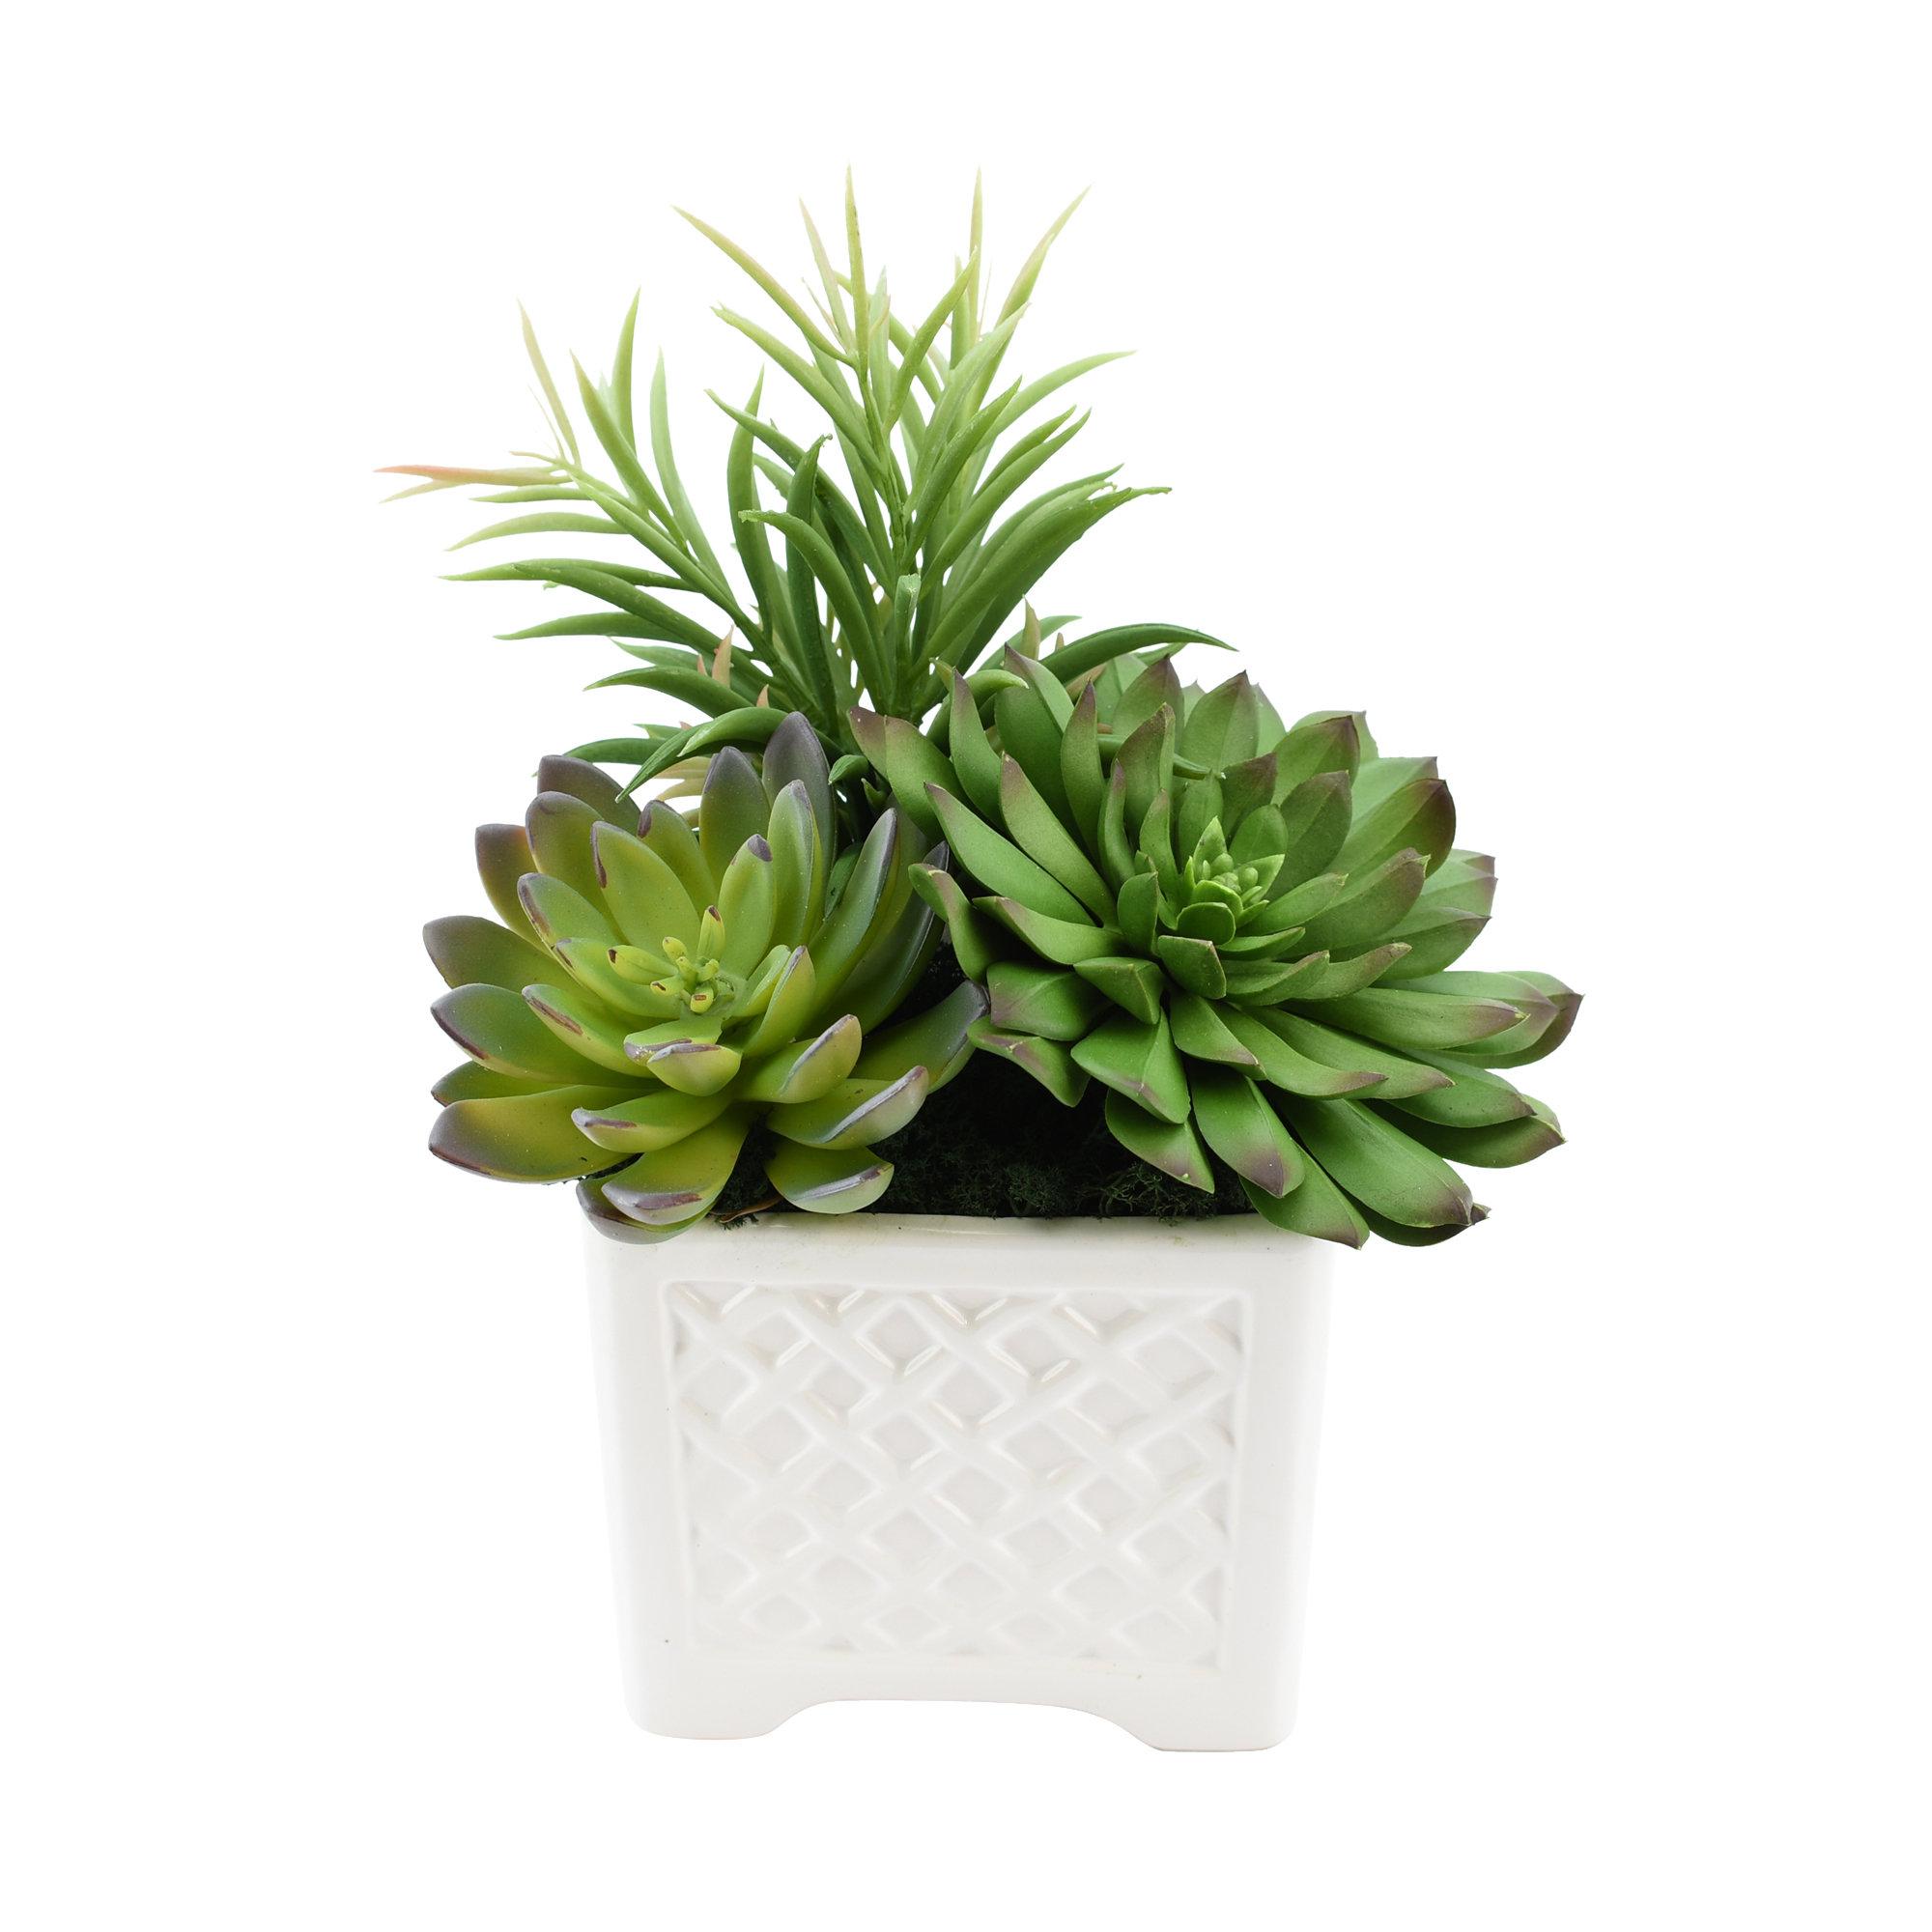 Ophelia Co Mixed Echeveria Desktop Succulent Plant In Pot Wayfair